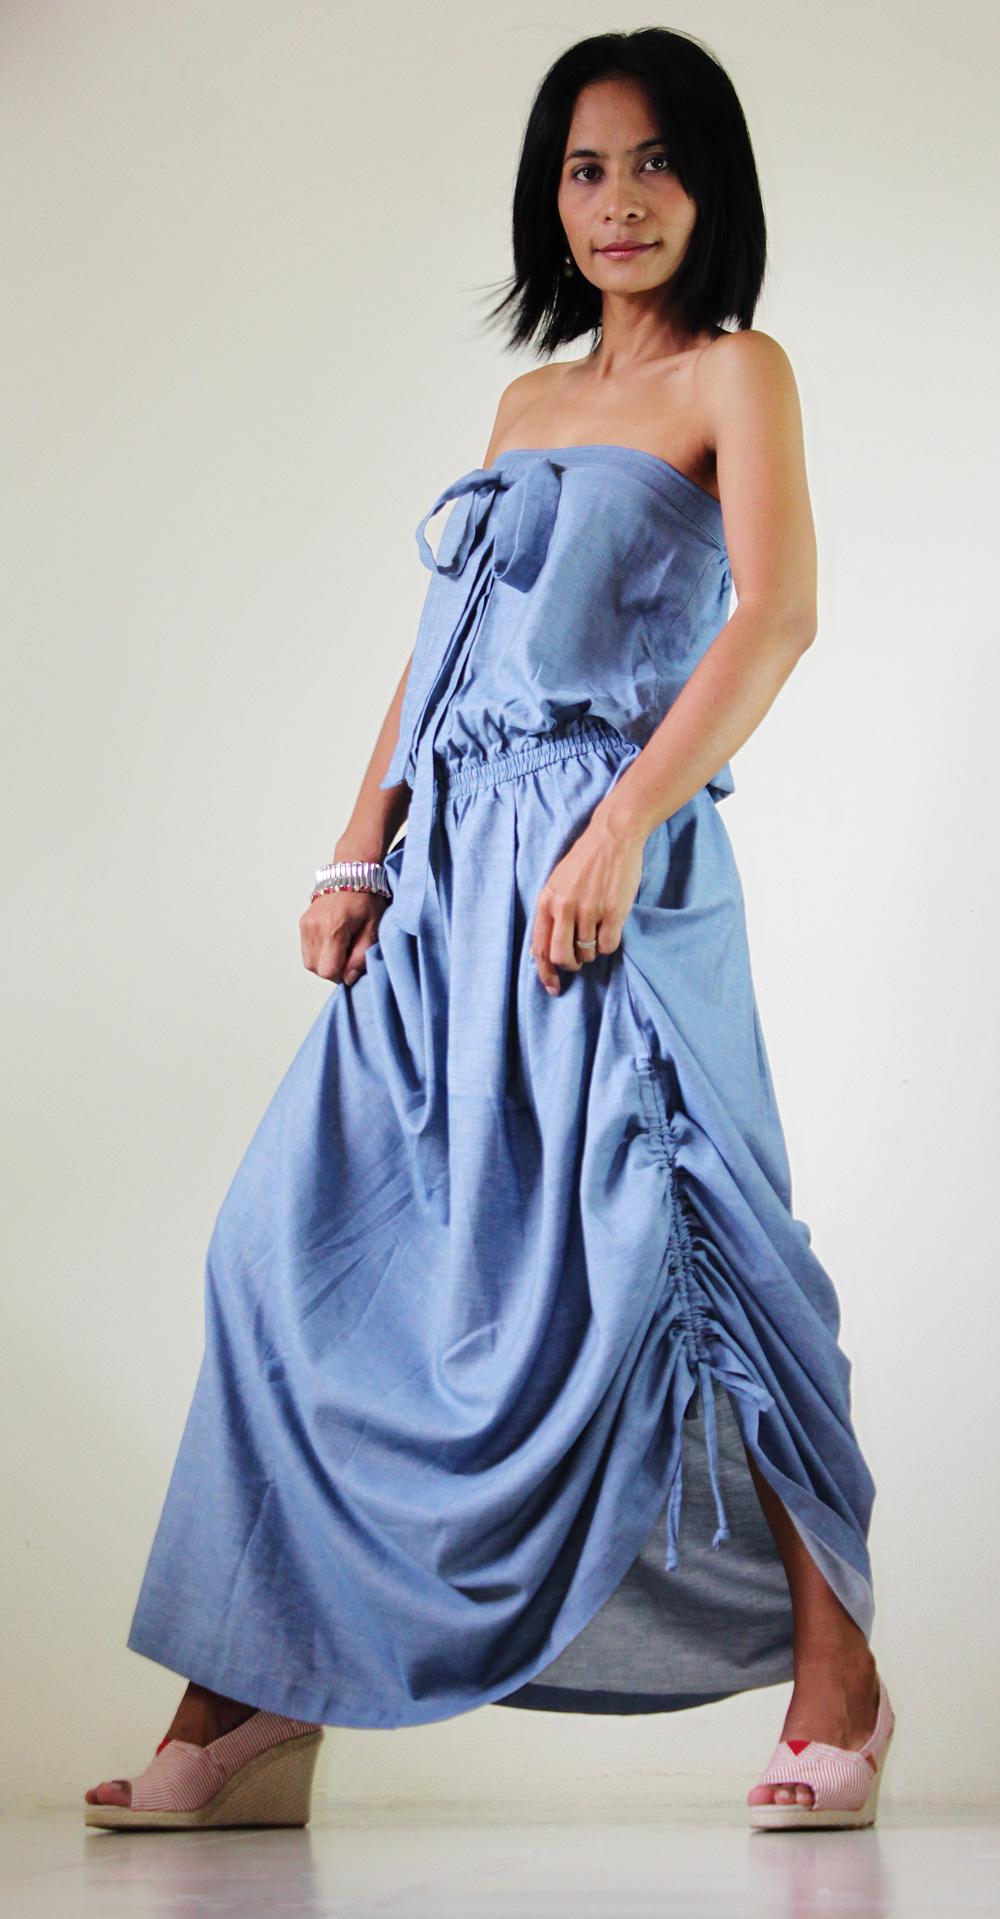 Denim Dress Long Light Blue Cotton Stonewashed Summer Maxi Sun dress : New Morning Sunshine Collection